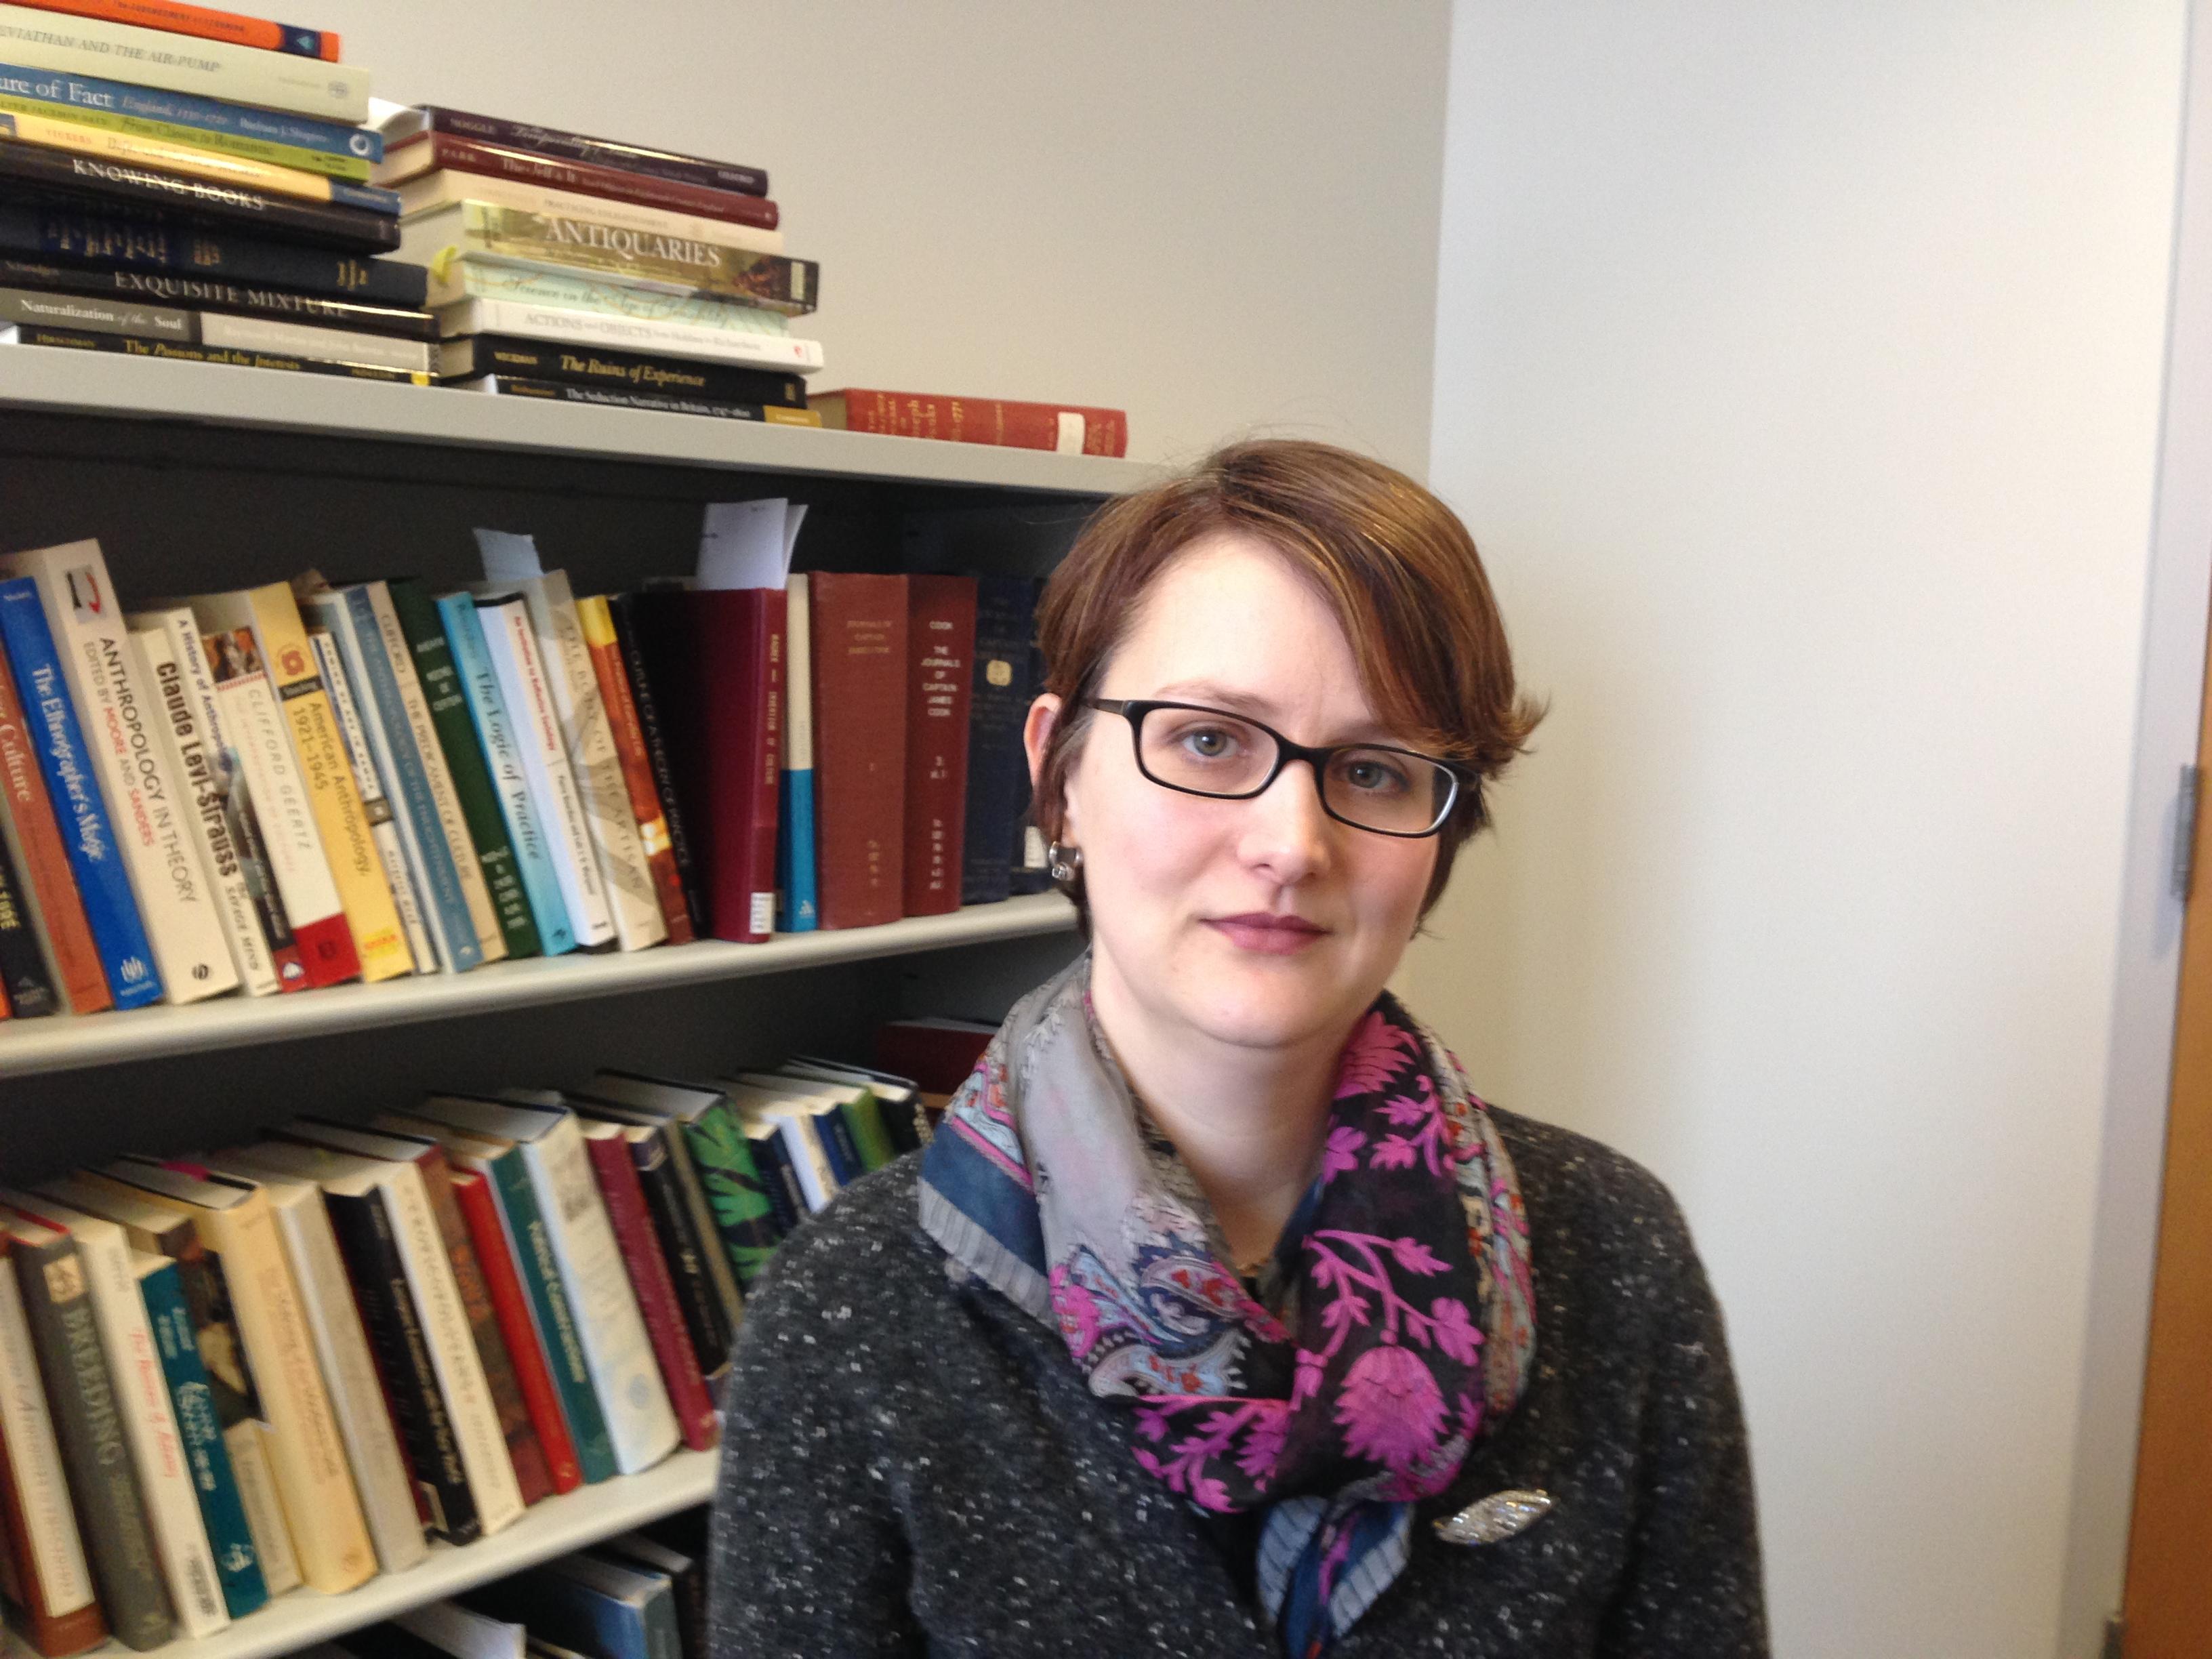 Phd dissertations online business - best essay helpers